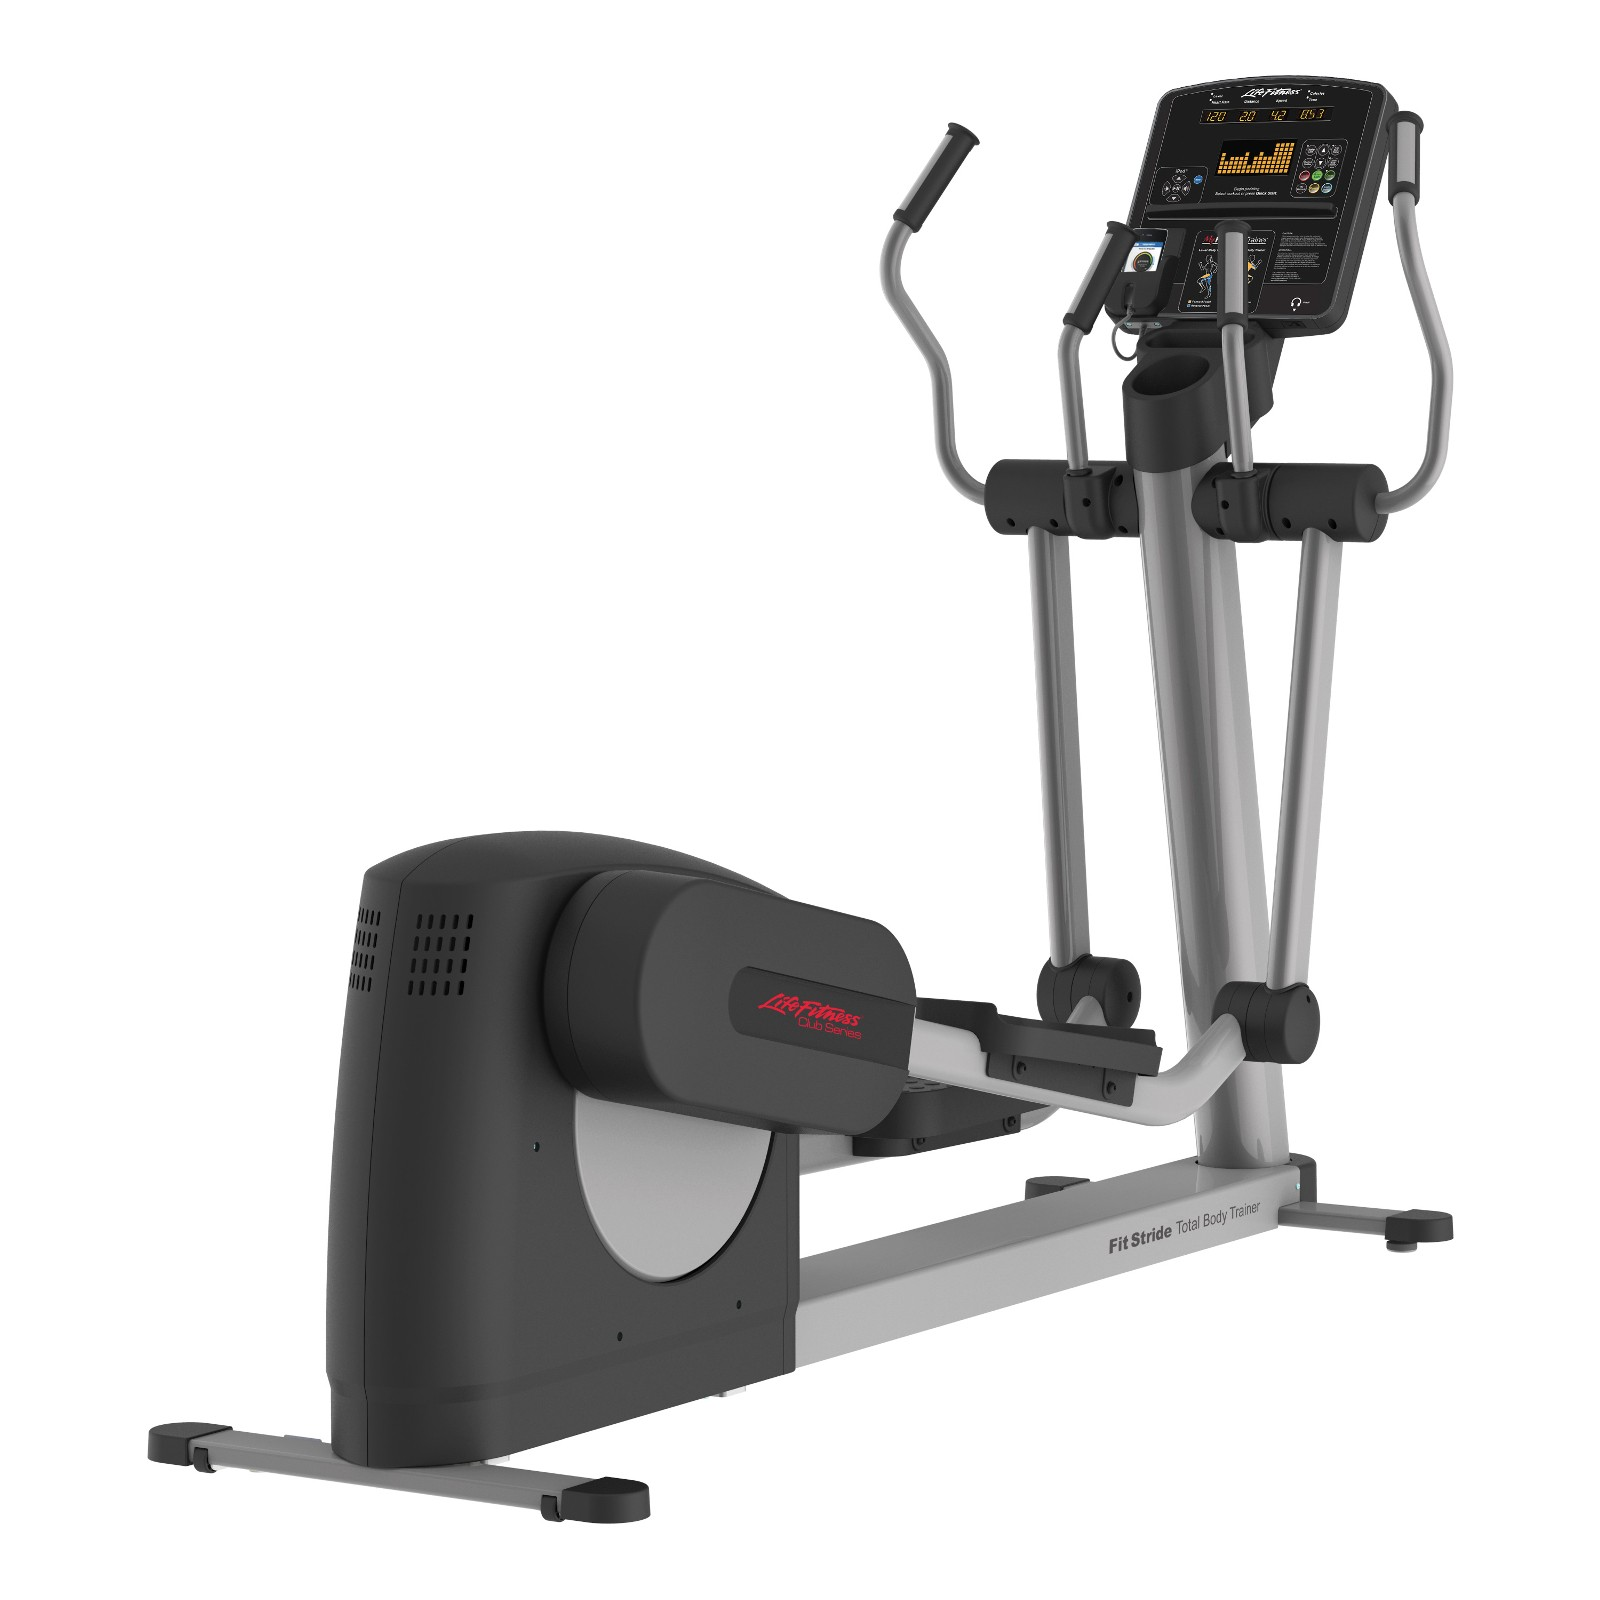 Life Fitness CSXH Club Series elliptical cross trainer